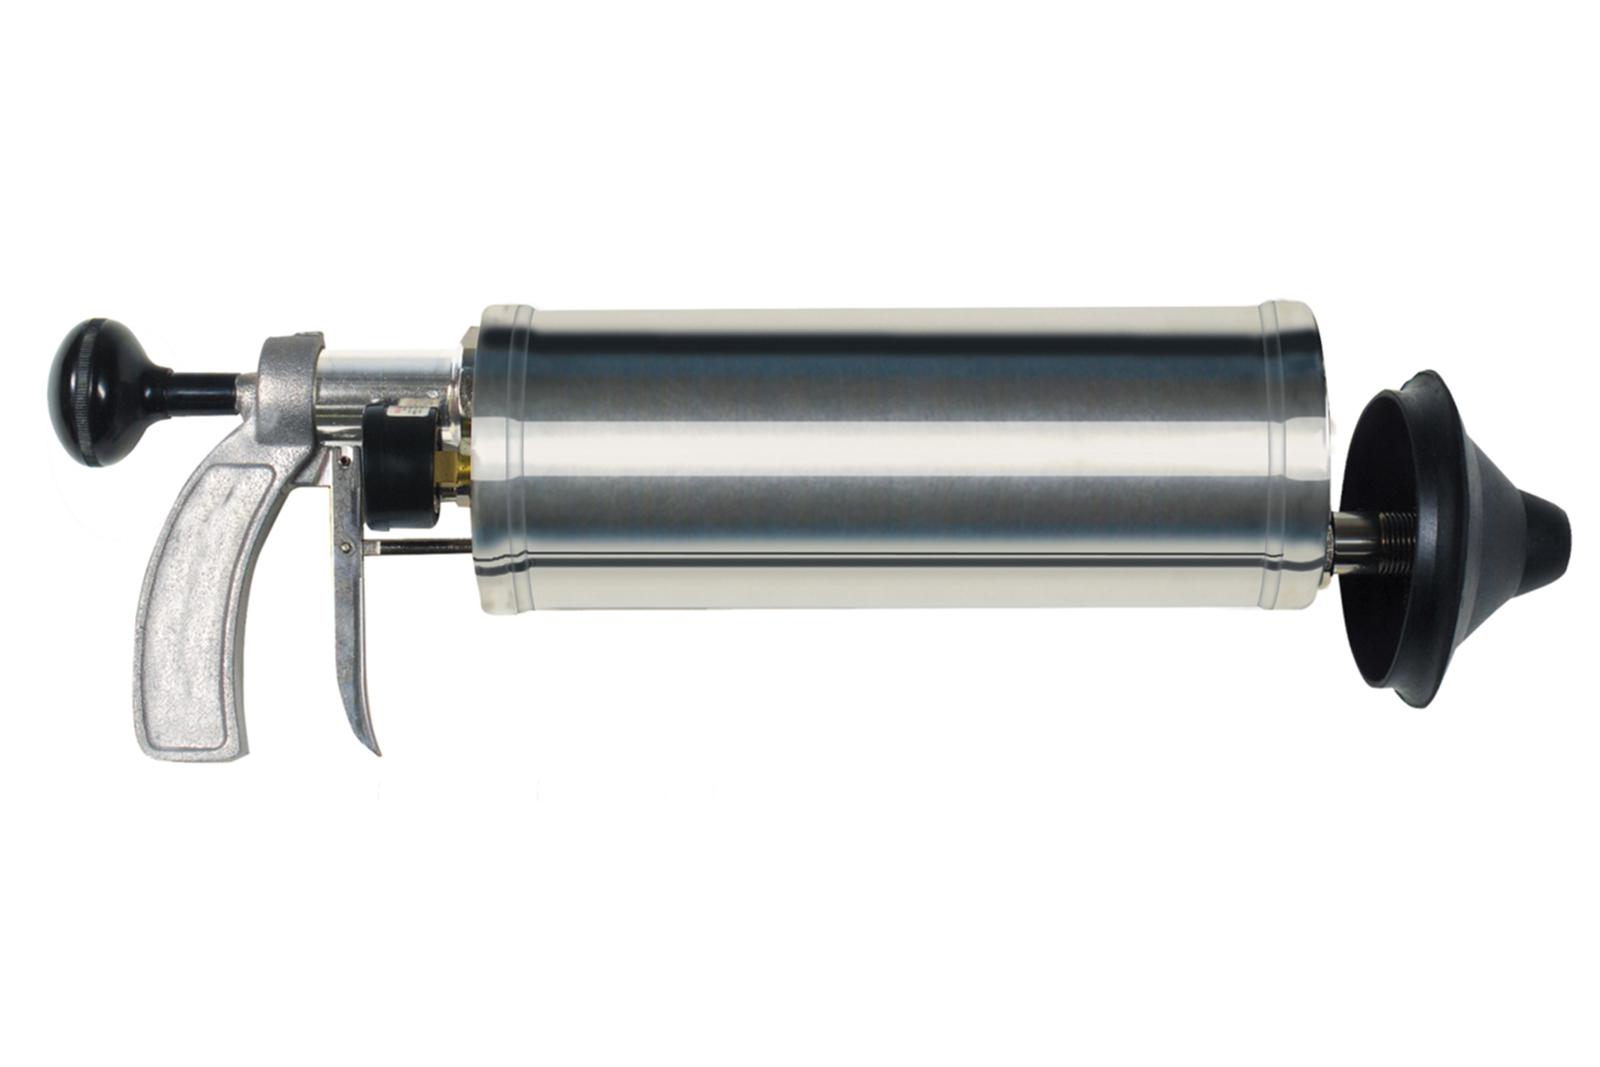 Пистолет промывочный General pipe Тайфун tns-b